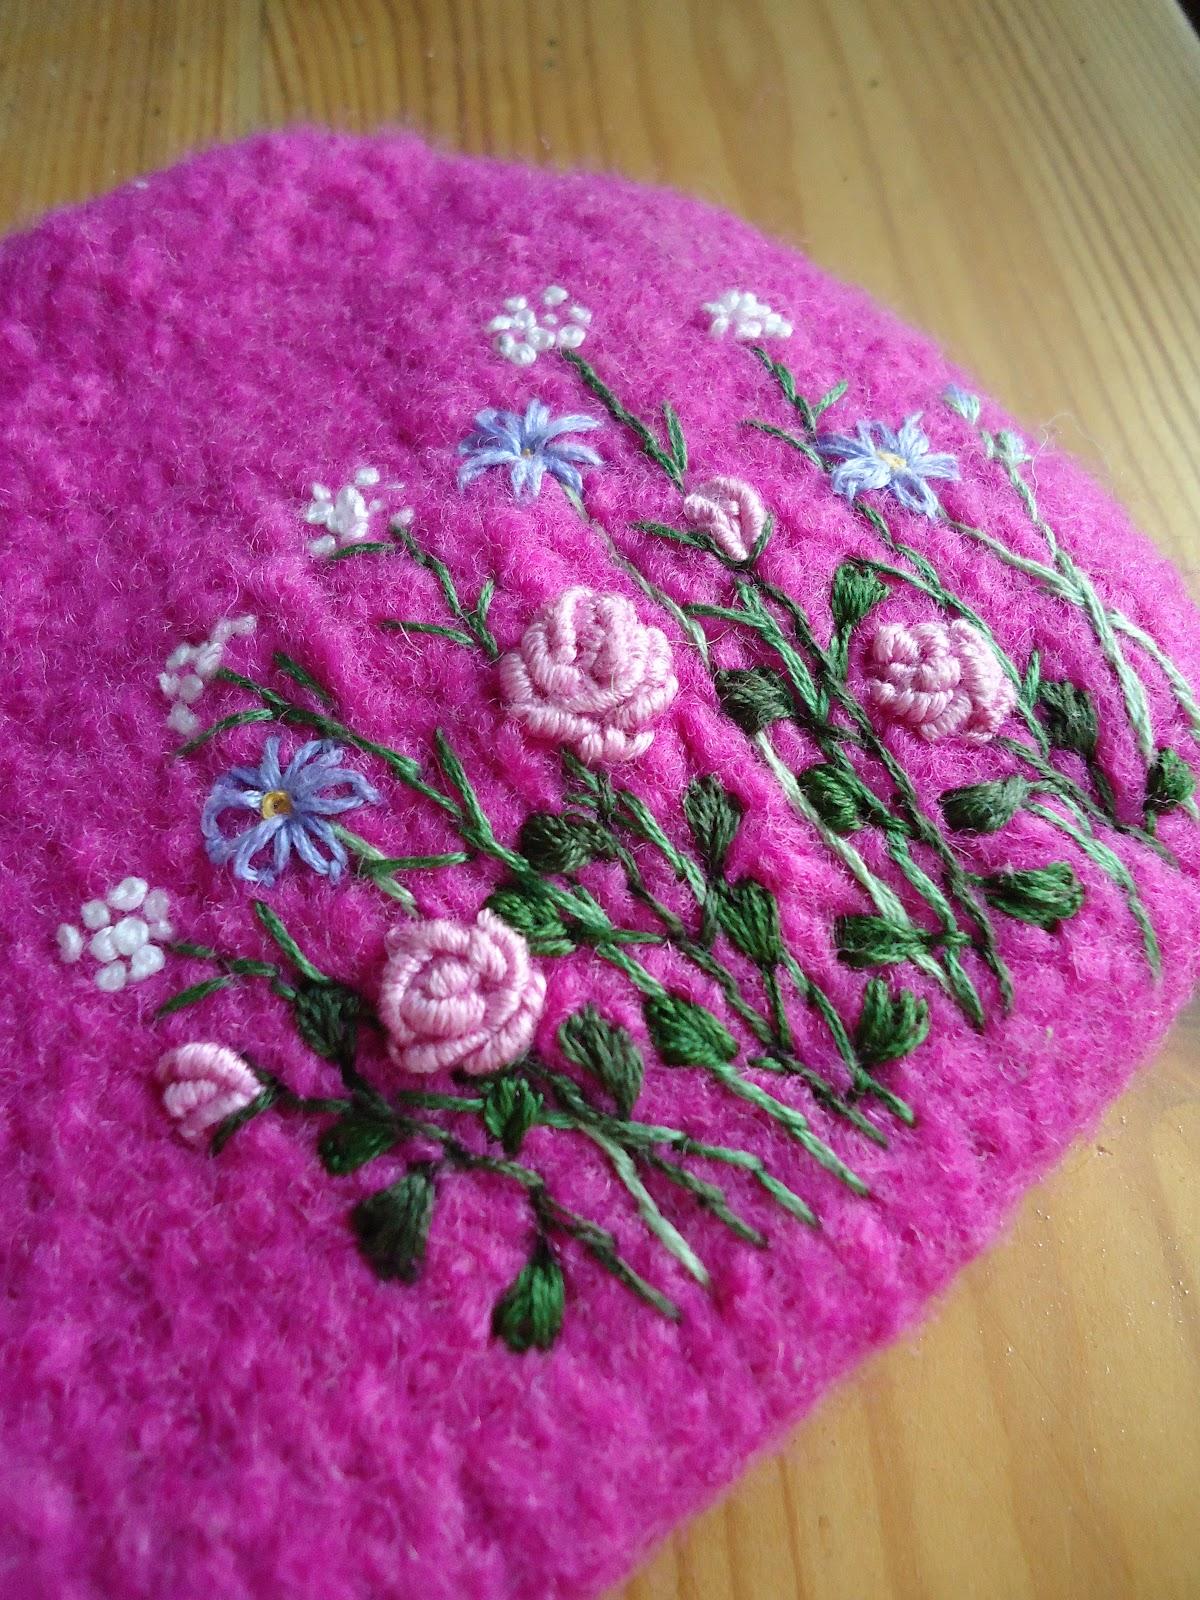 Knitting Rose Stitch : Knit n pearl bullion stitch roses